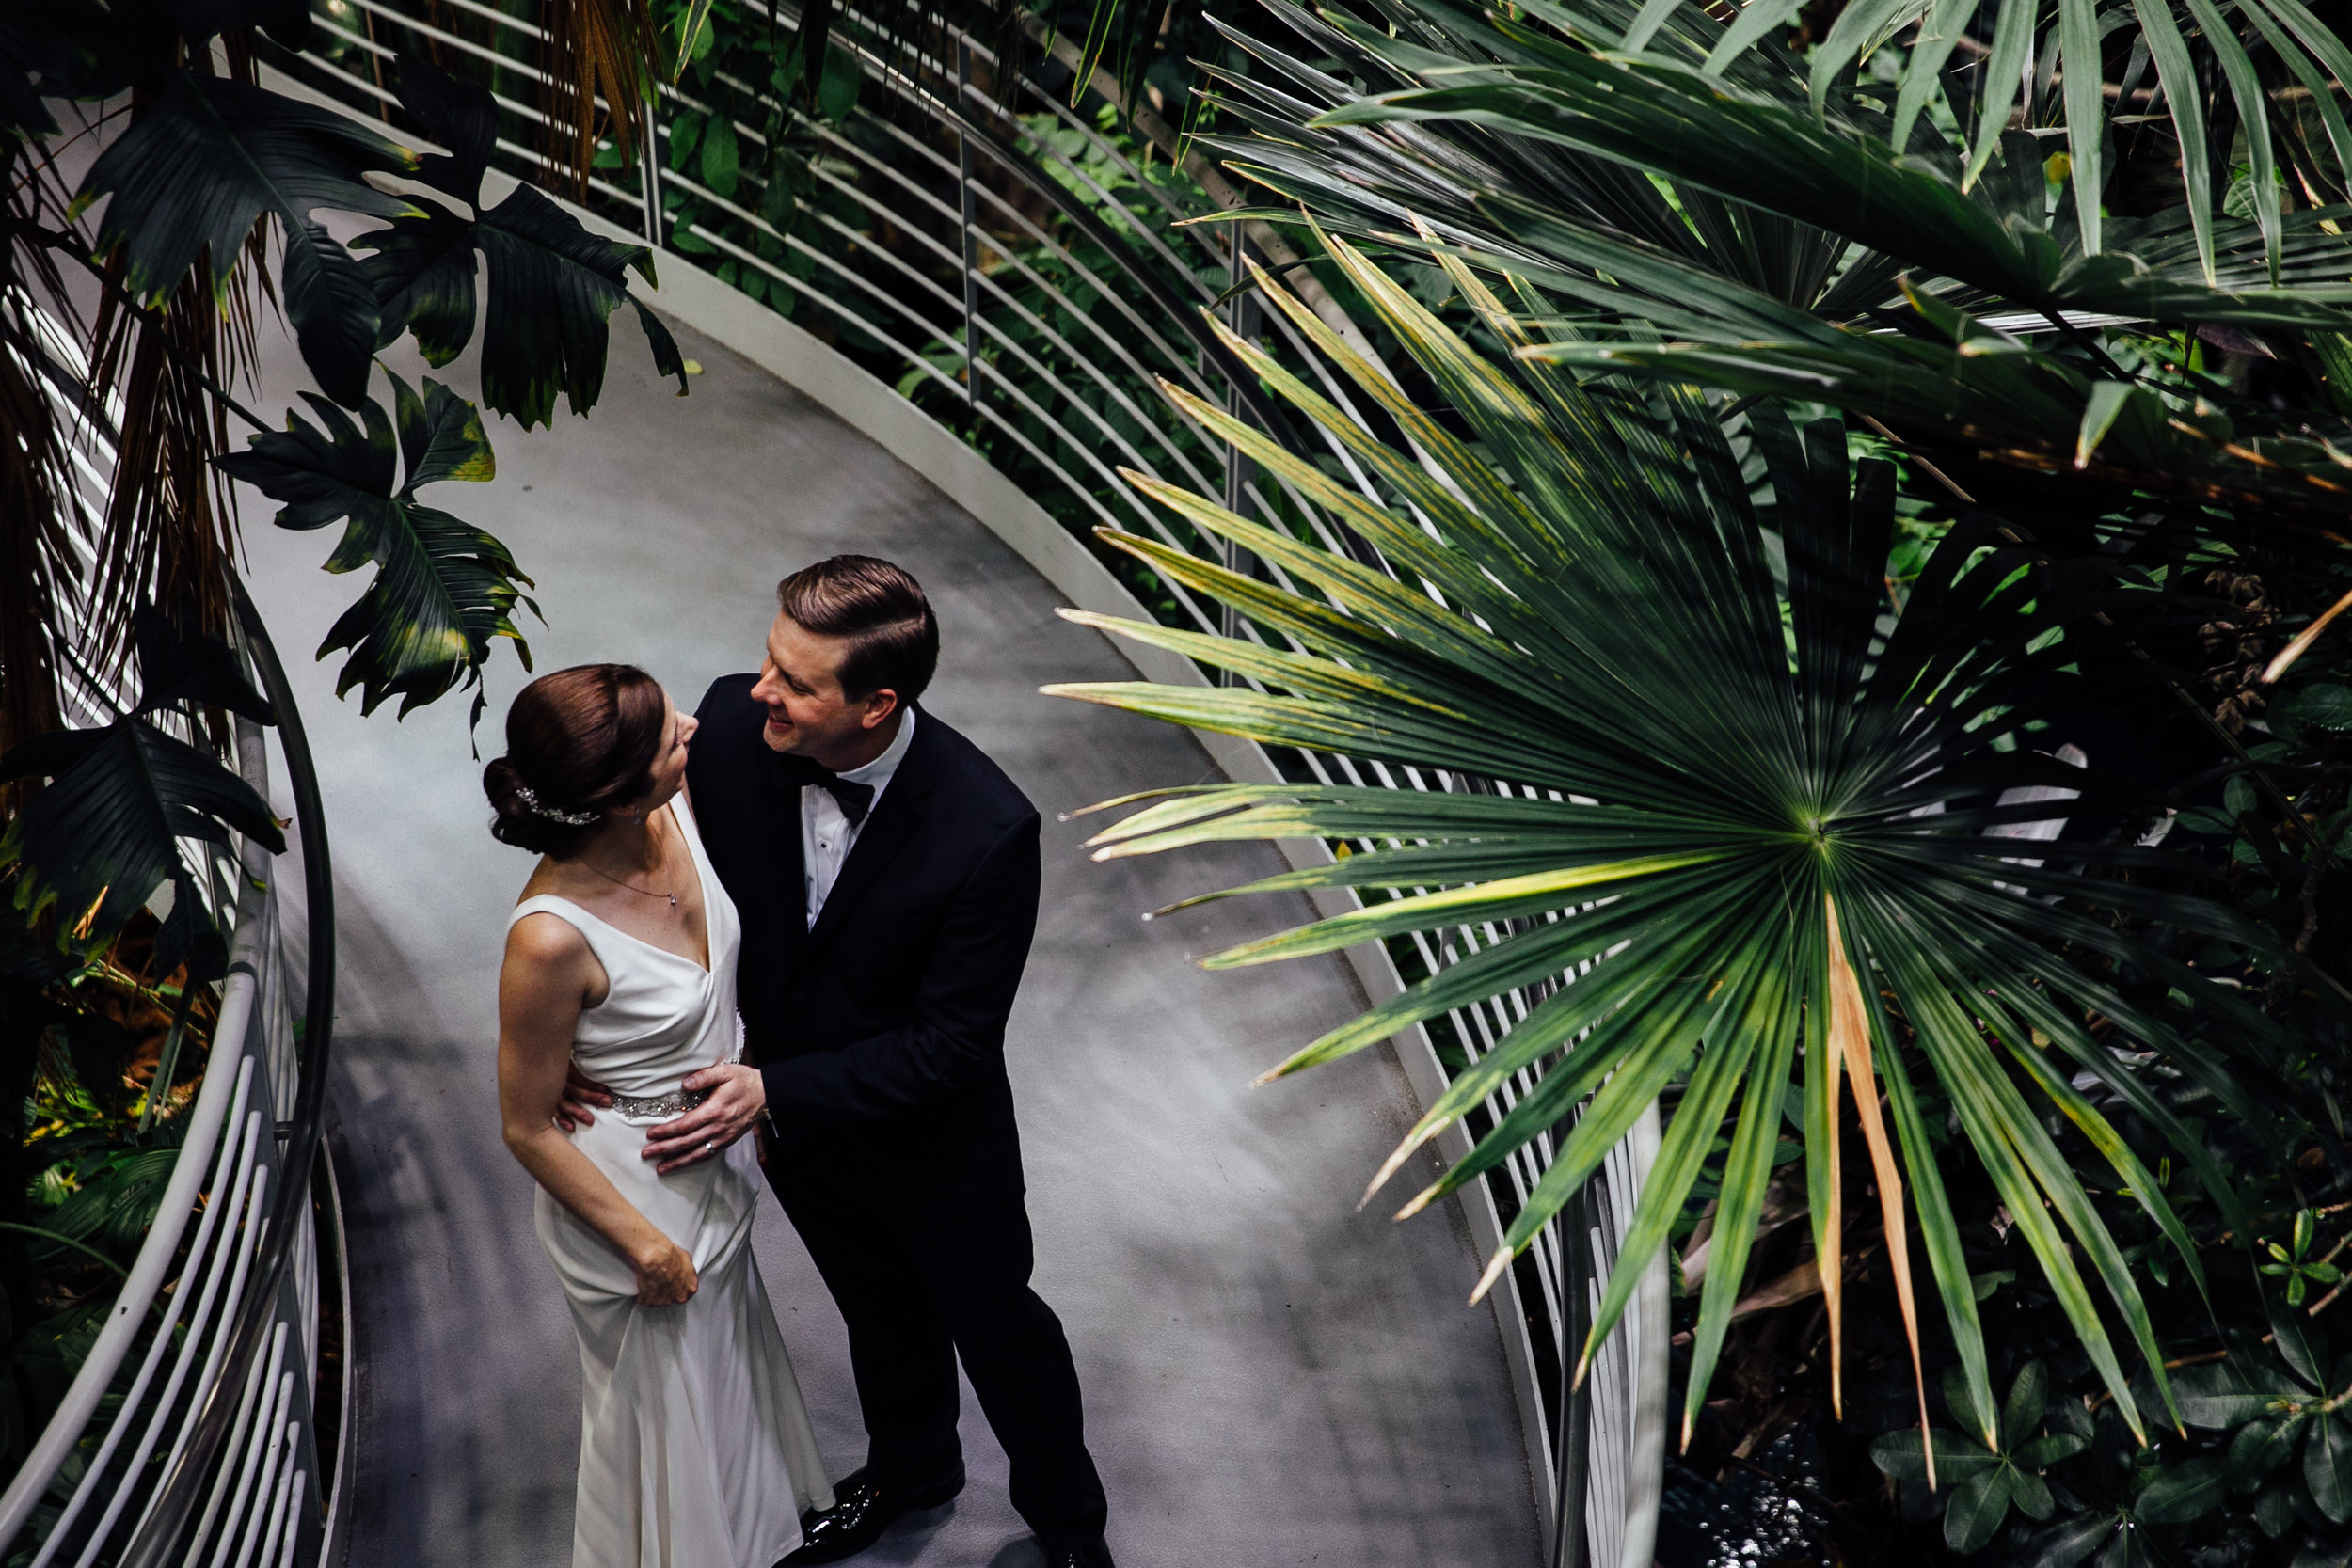 Wedding_KathleenMichael_BG_Portraits-343.jpg